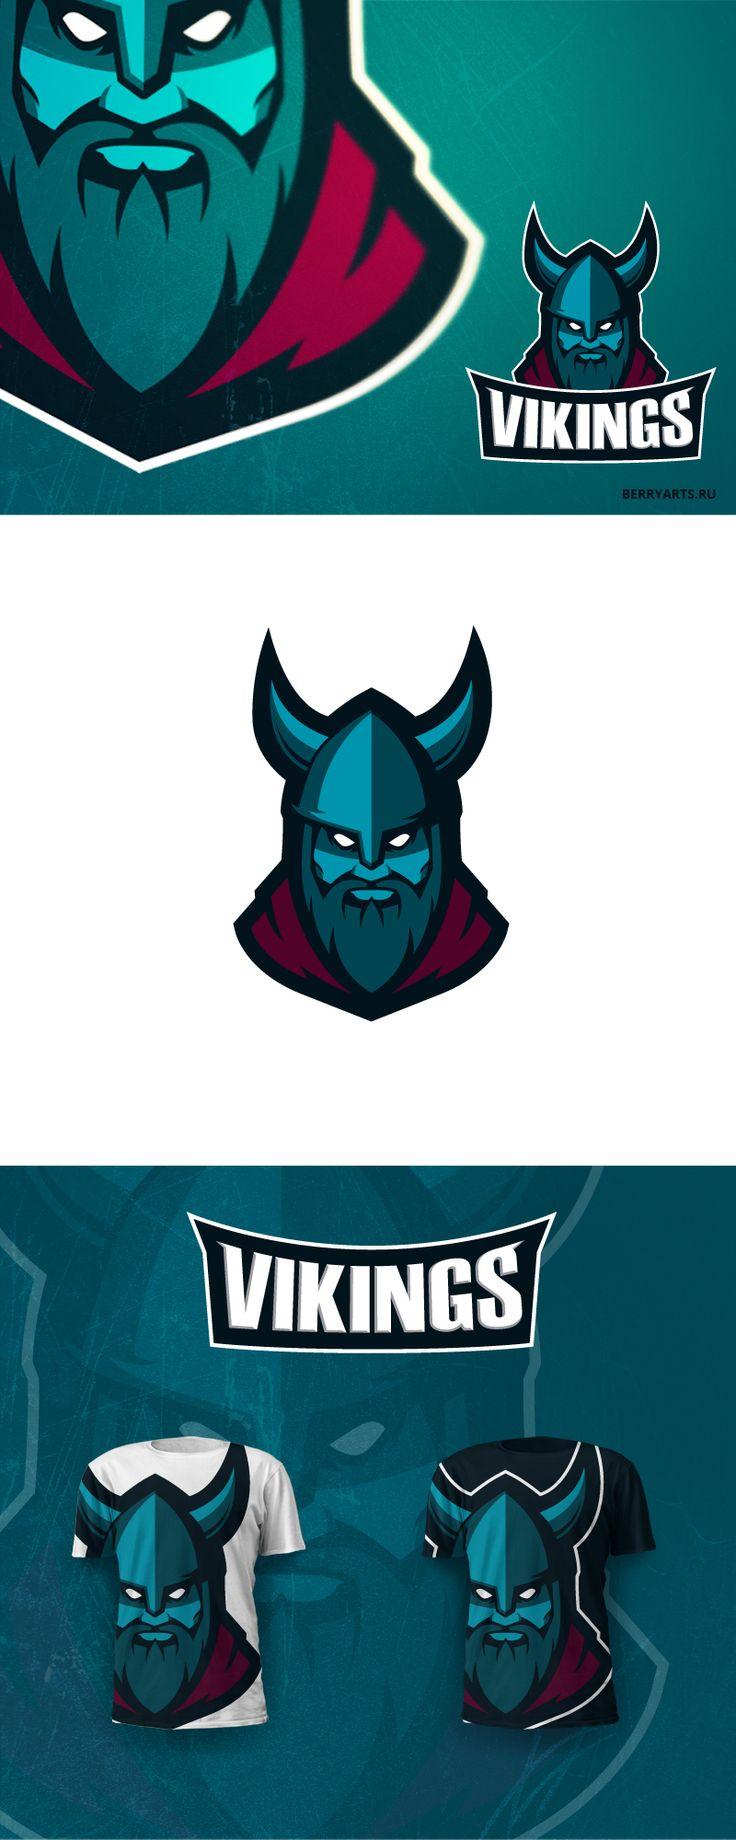 Vikings mascot on Behance